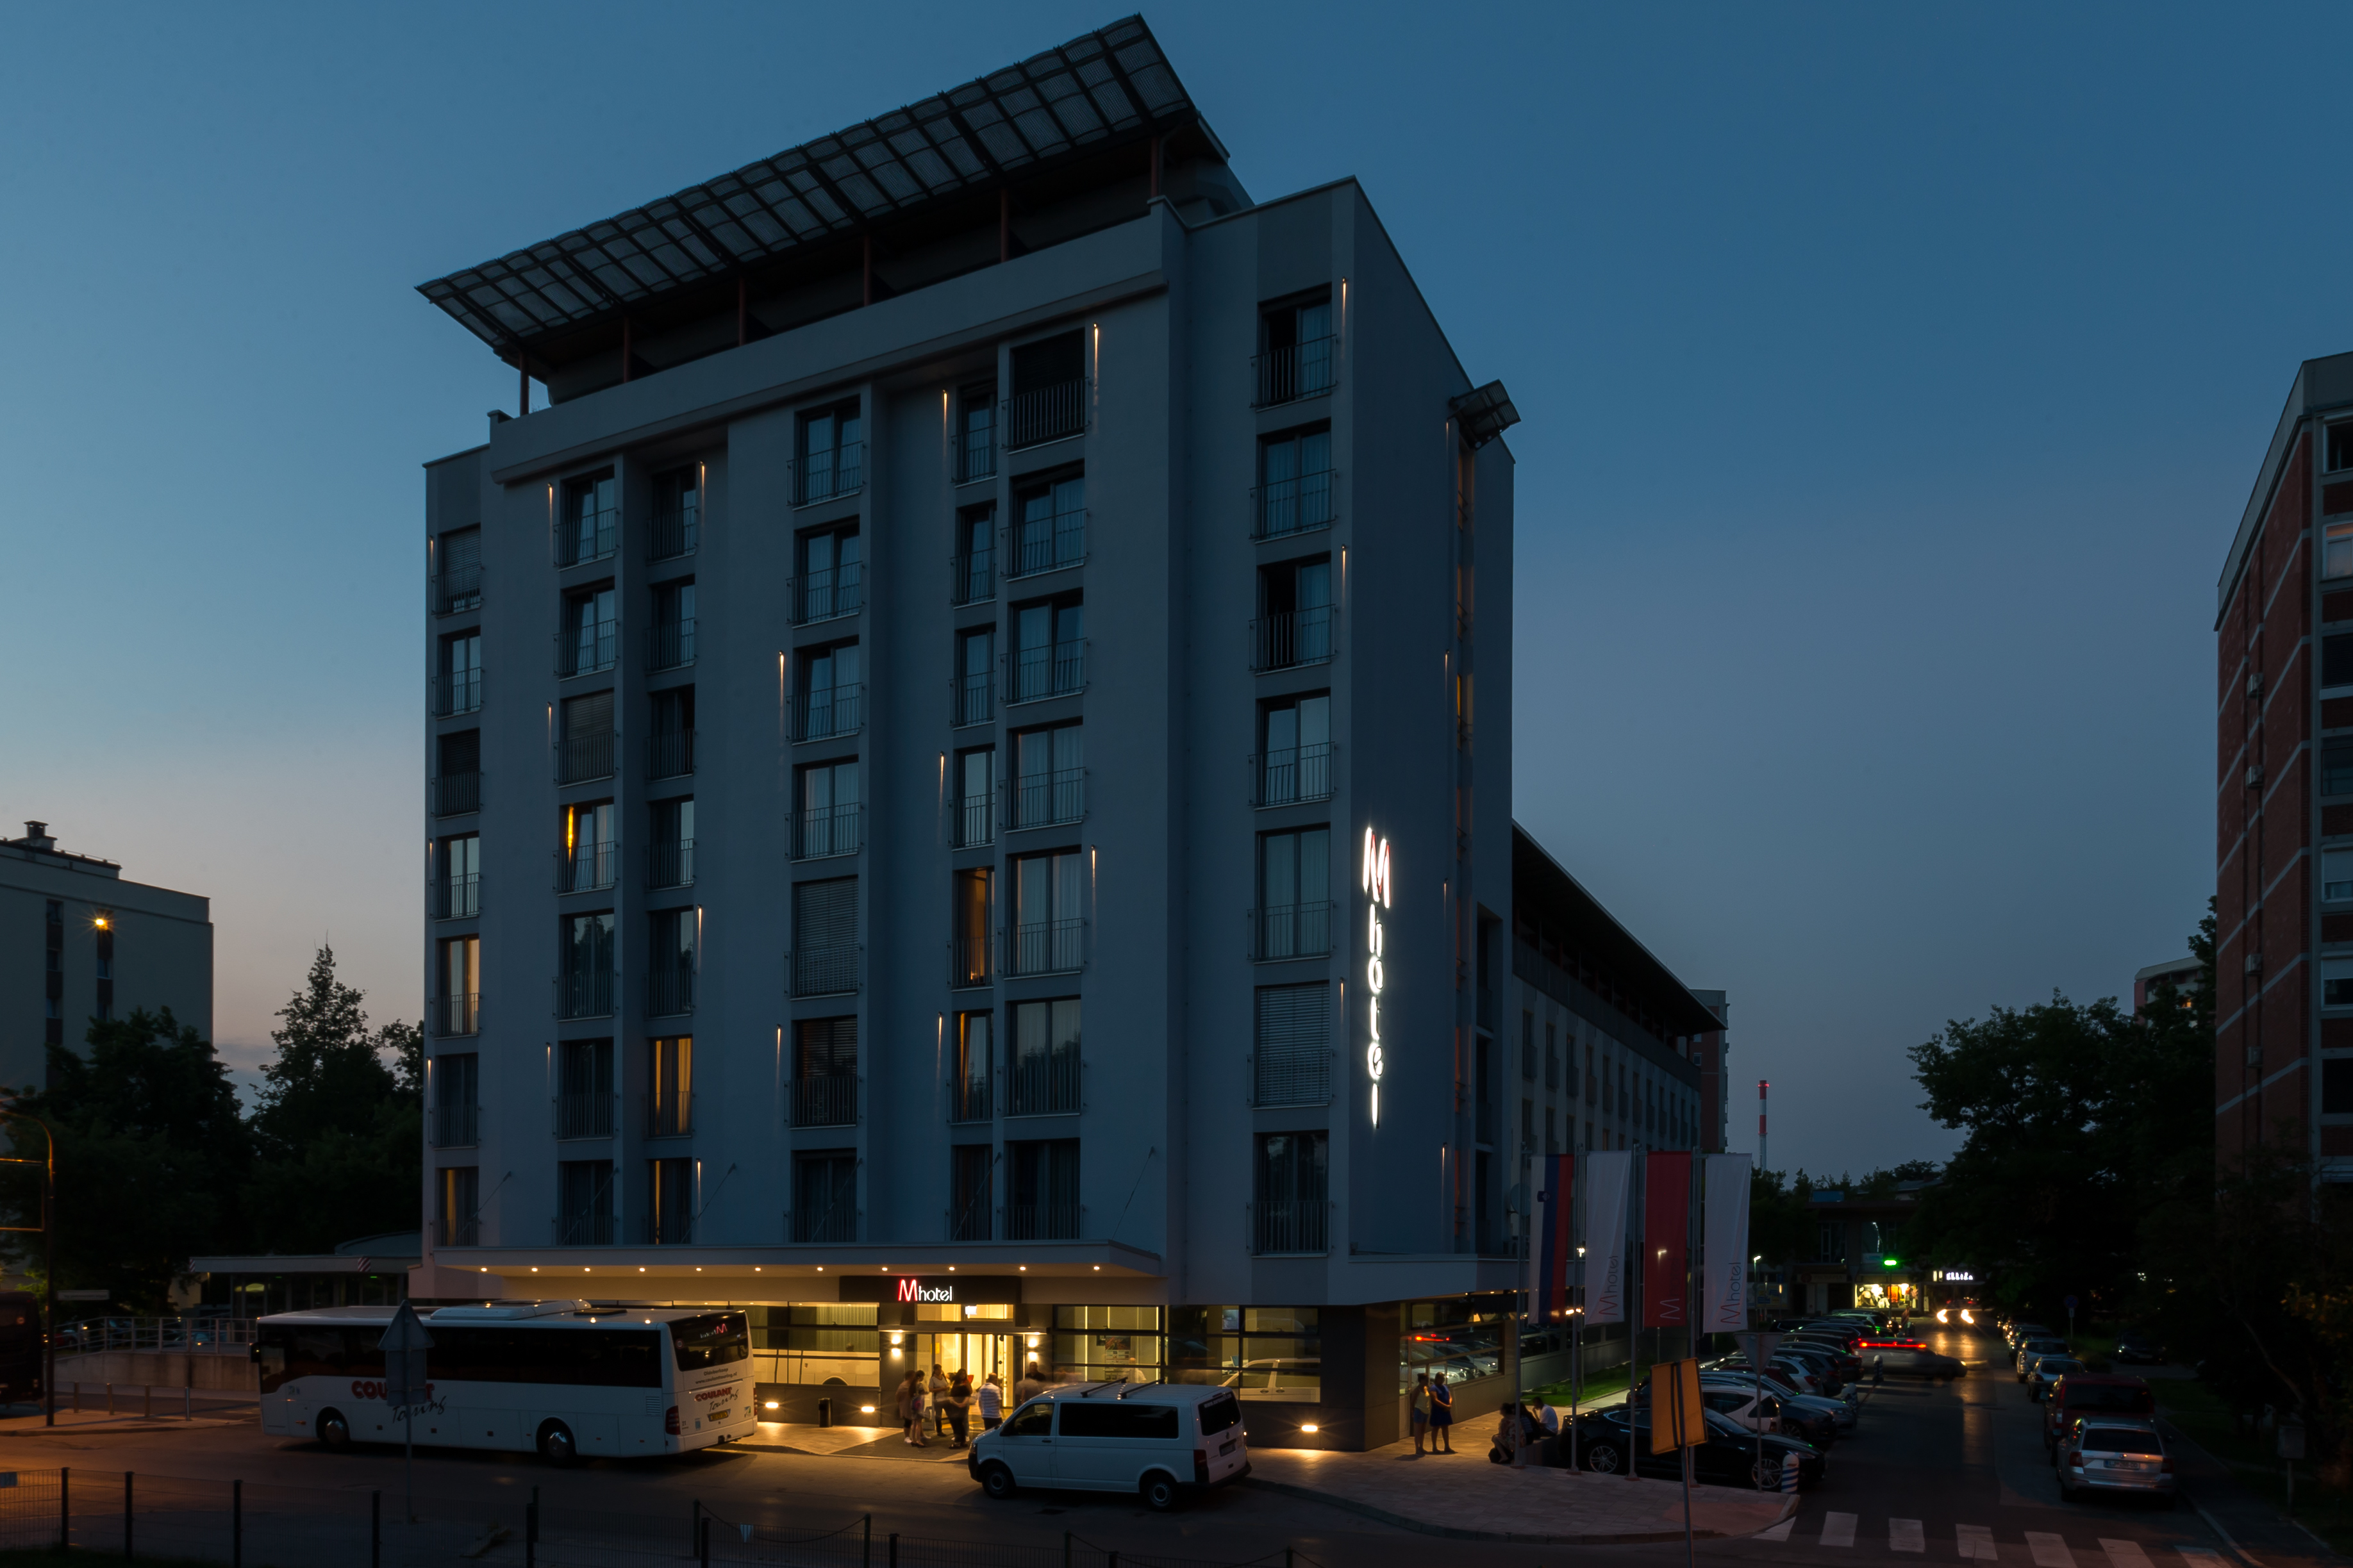 Hotel M, Ljubljana